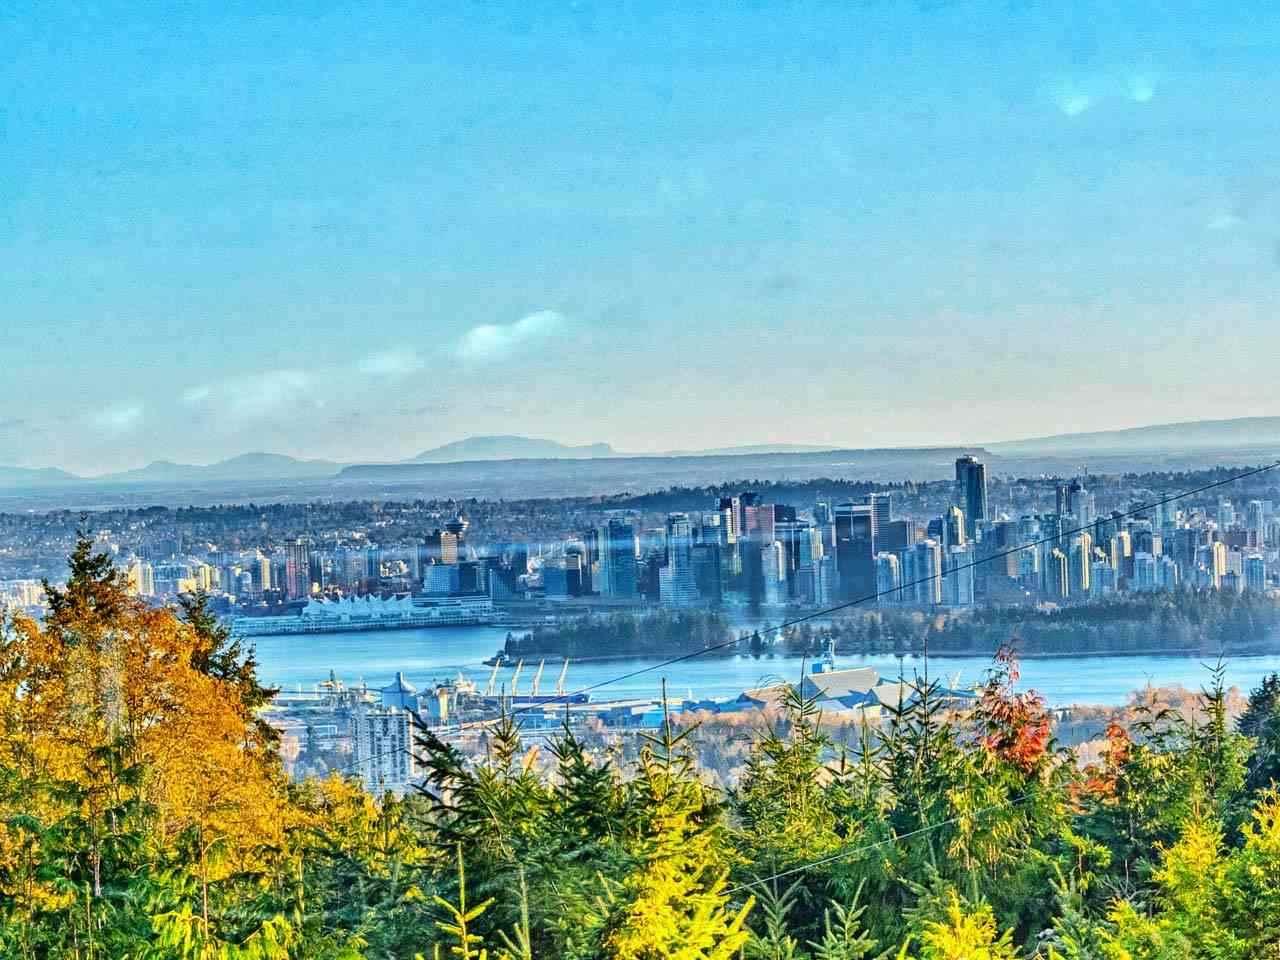 522 BALLANTREE Glenmore, West Vancouver (R2215508)